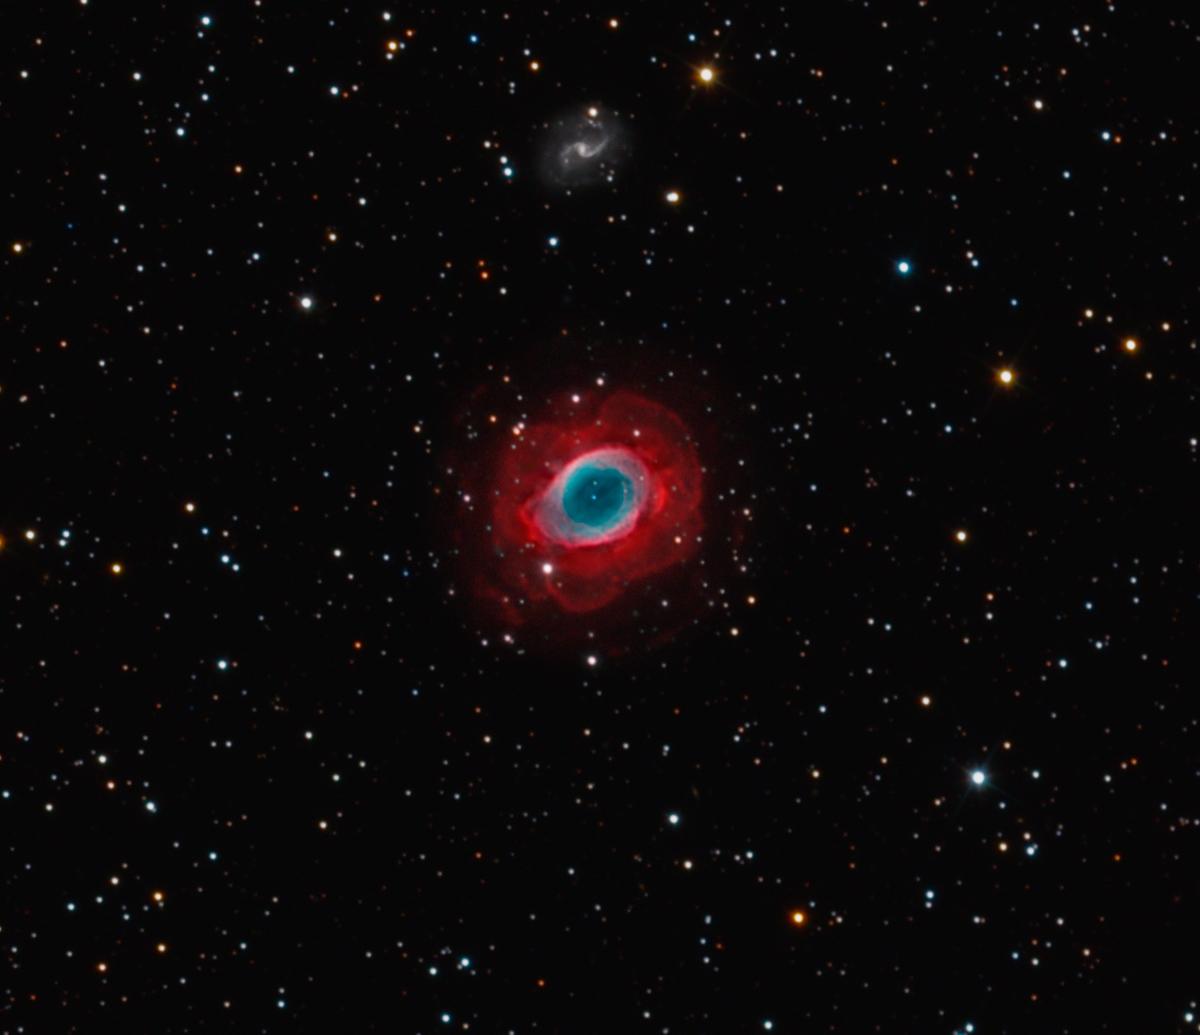 Ring Nebula a Jewel